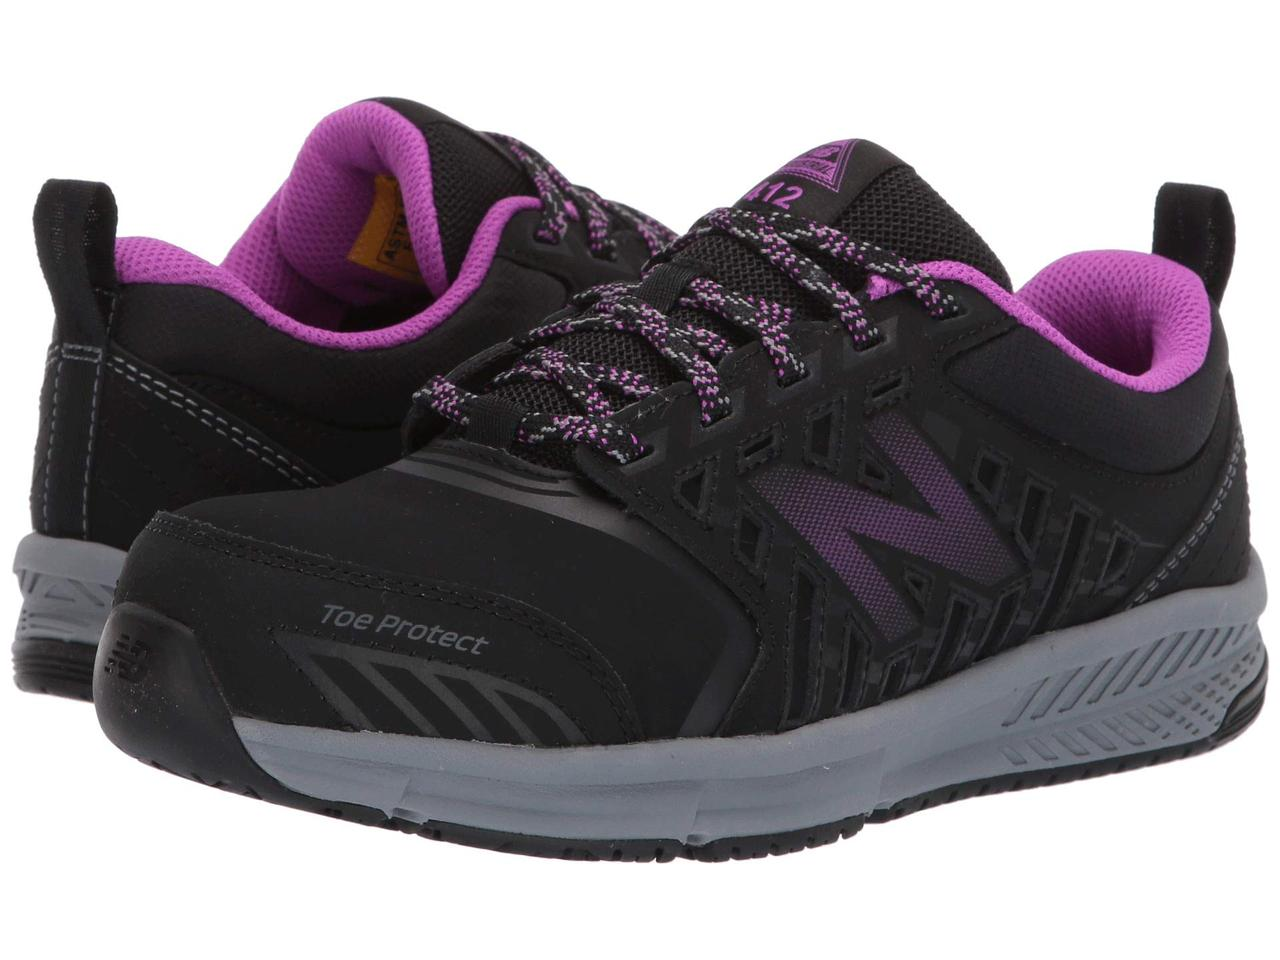 Кроссовки/Кеды (Оригинал) New Balance WID412v1 Black/Purple